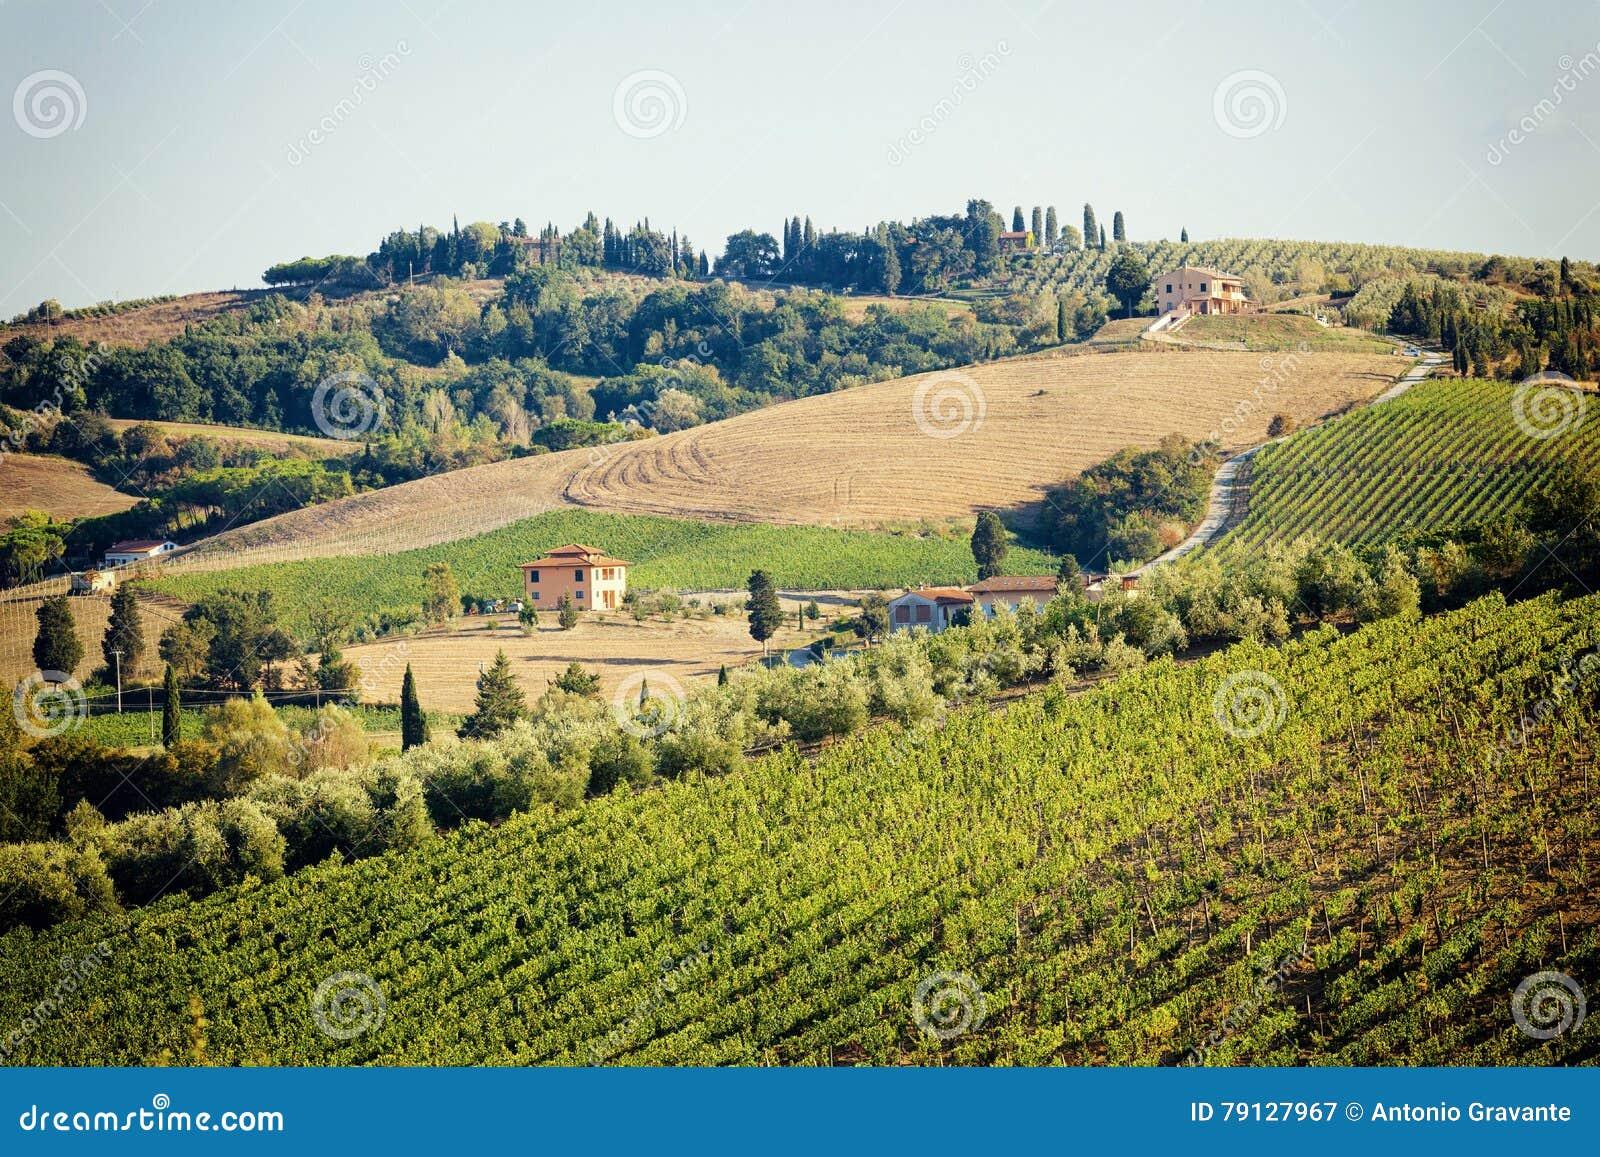 Vineyards with stone house, Tuscany, Italy